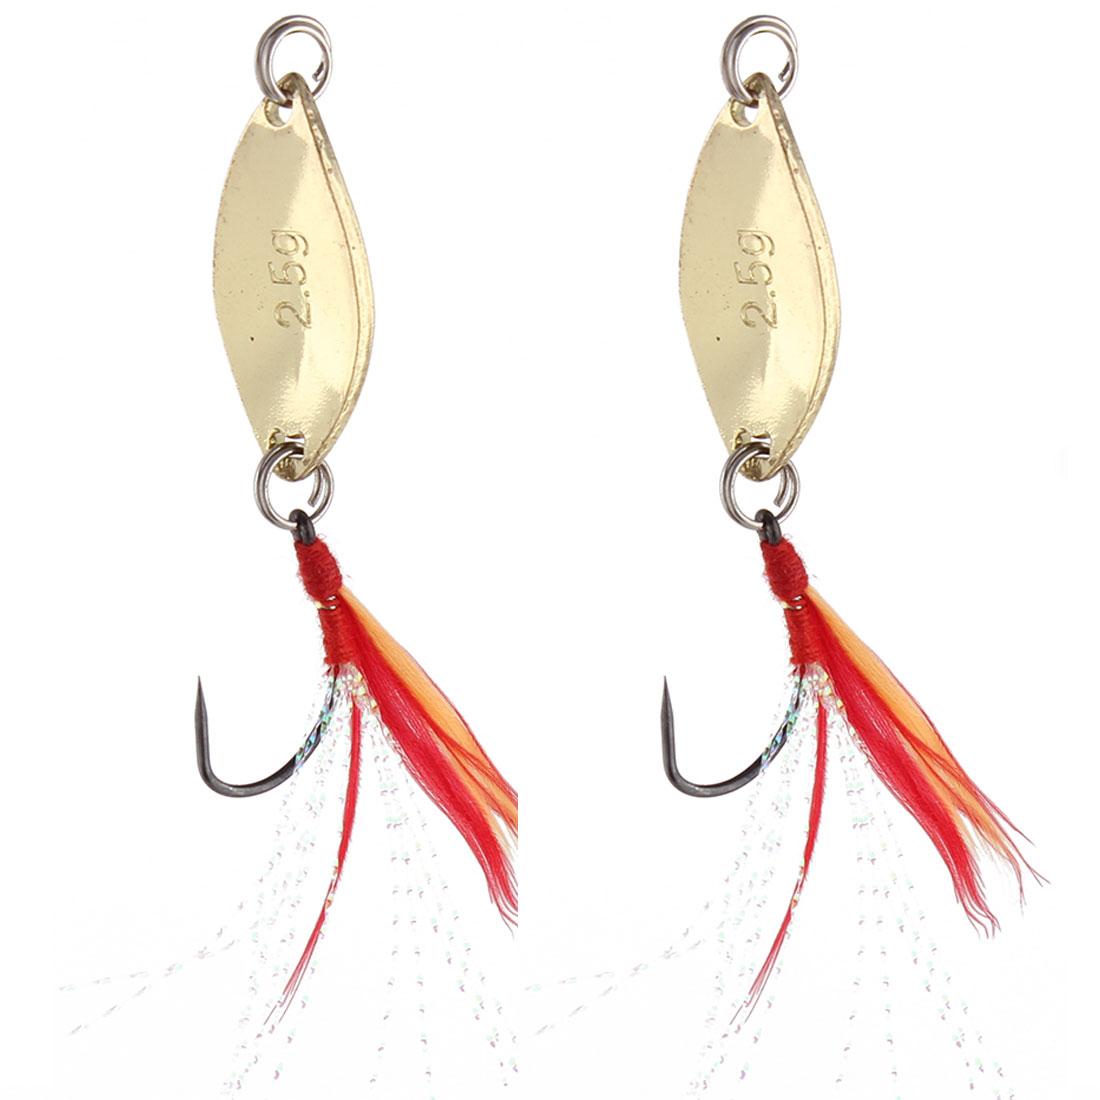 Fishing Fish Metal Angling Reflective Barb Lure Hooks Gold Tone 2 Pcs